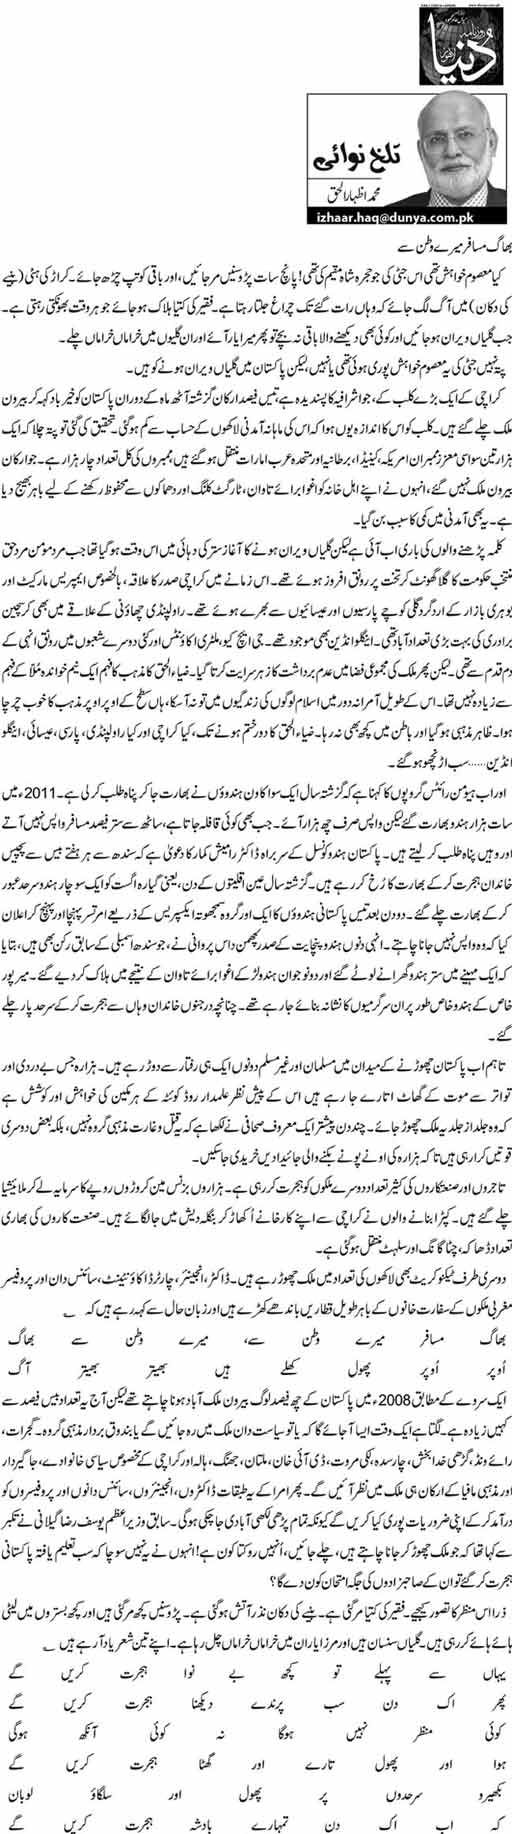 Bhag musafir mere watan se - M. Izhar ul Haq